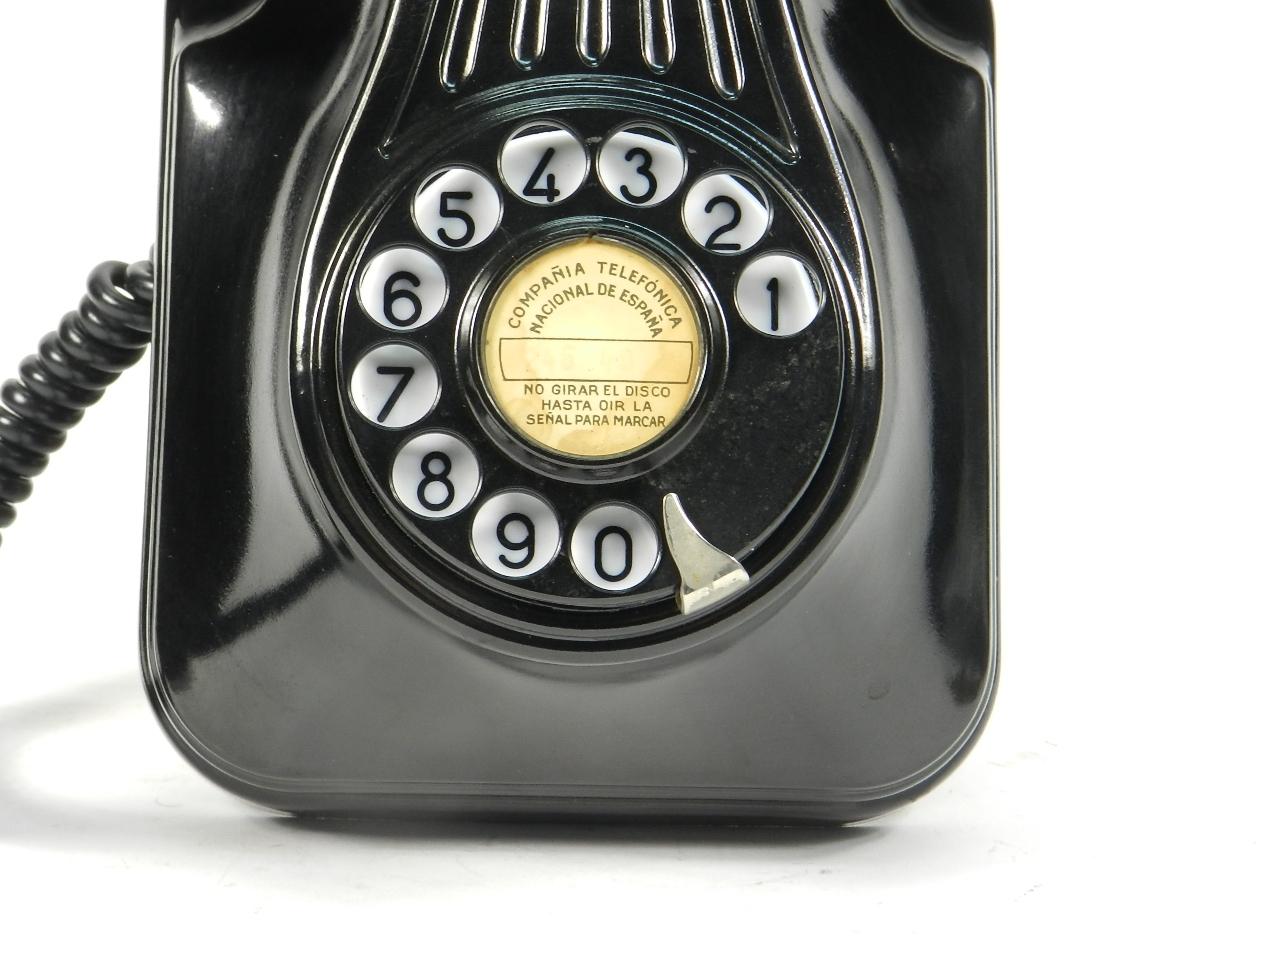 Imagen TELEFONO  STANDARD ELECTRICA  AÑO 1940 41818